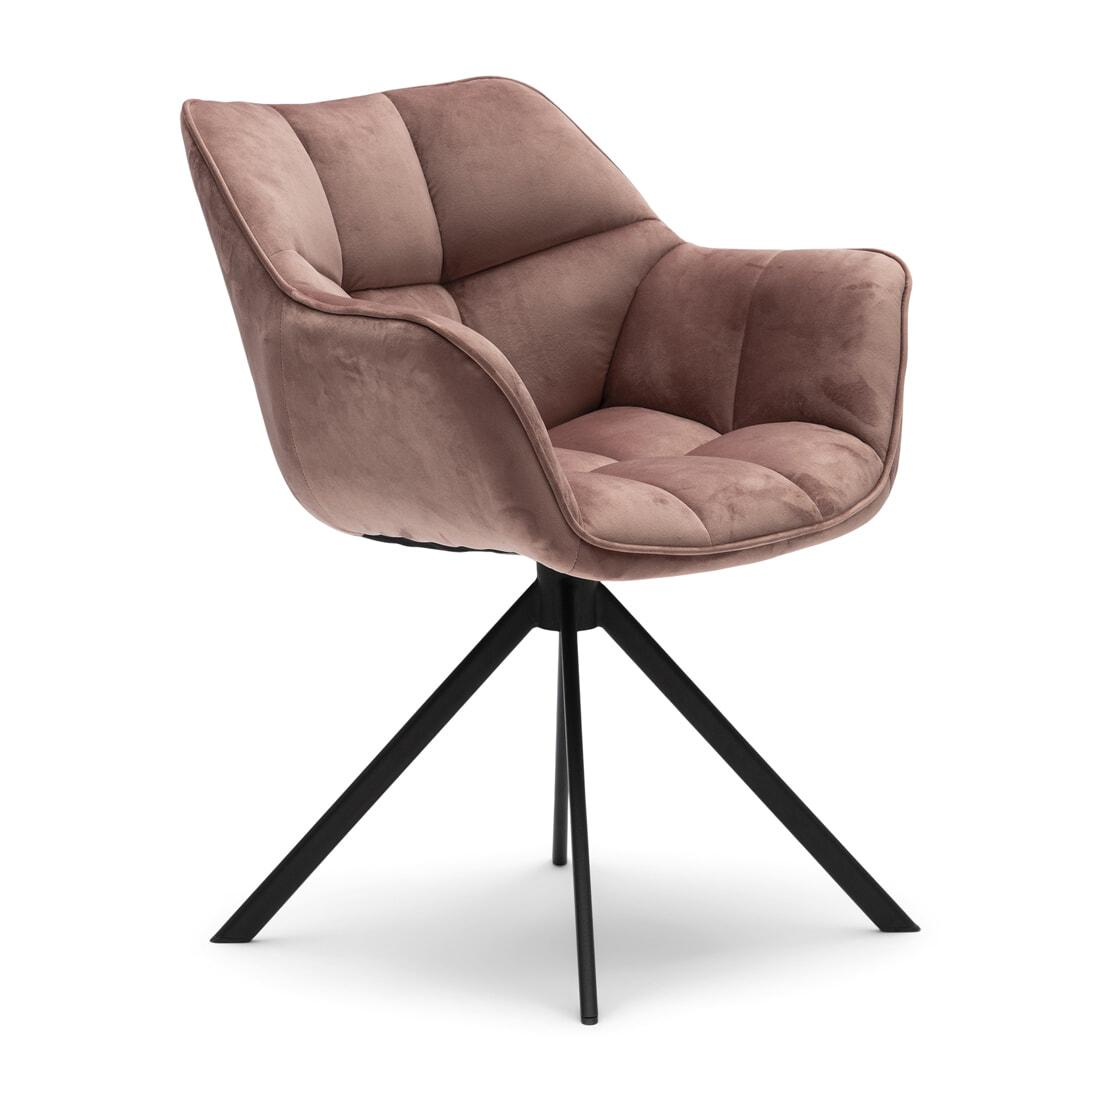 Rivièra Maison Eetkamerstoel 'Carnaby' Velvet III, kleur Rosé Stain | Rivièra Maison